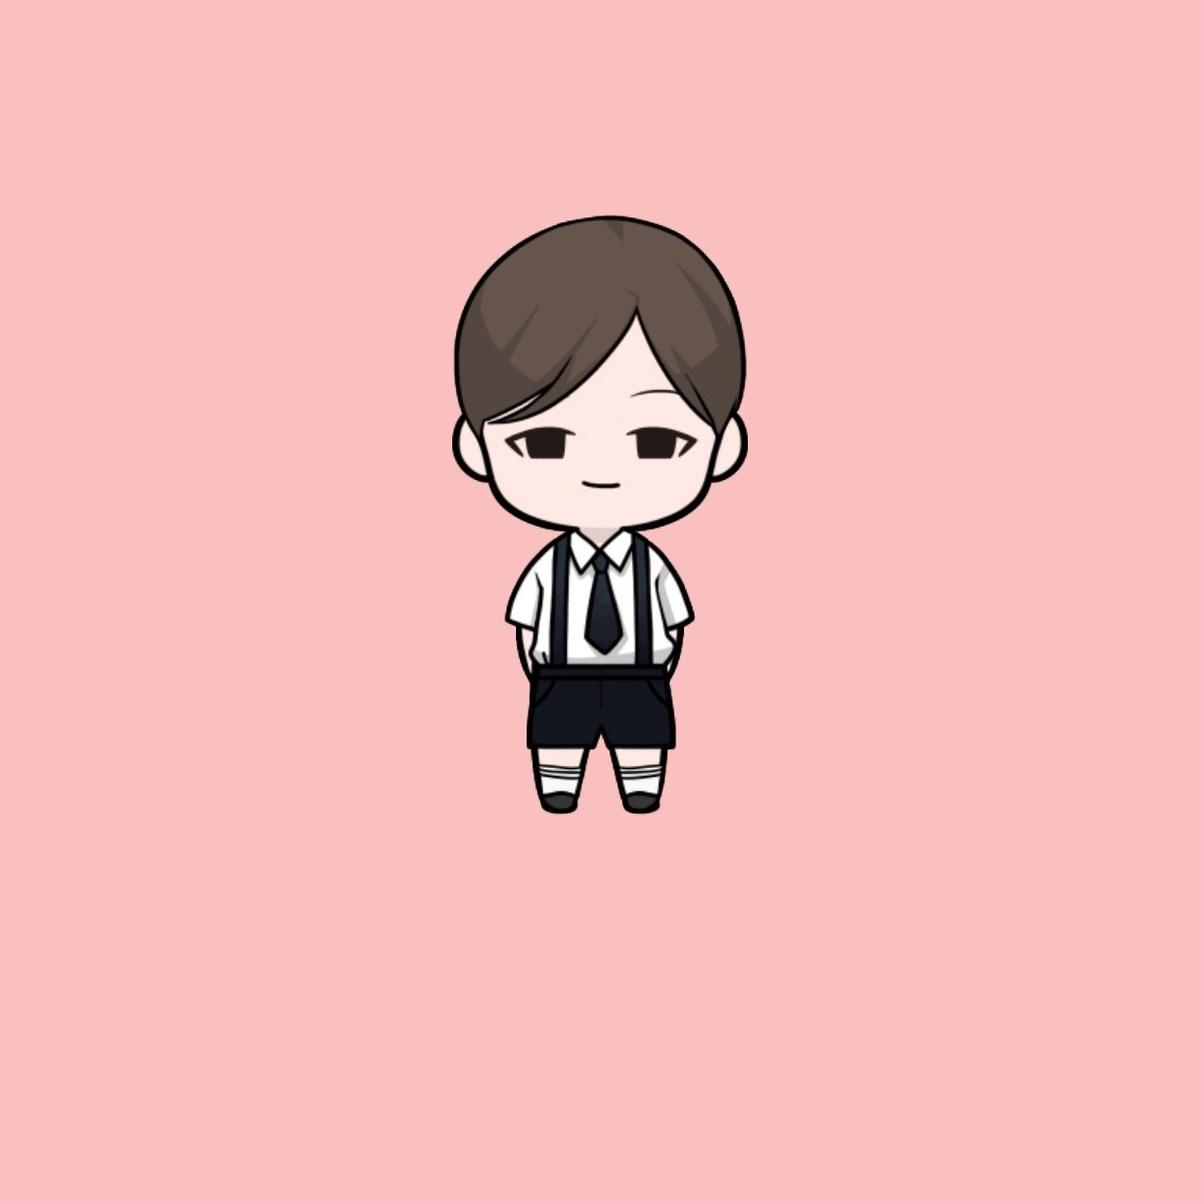 f:id:shirobotchan:20200719185651j:plain